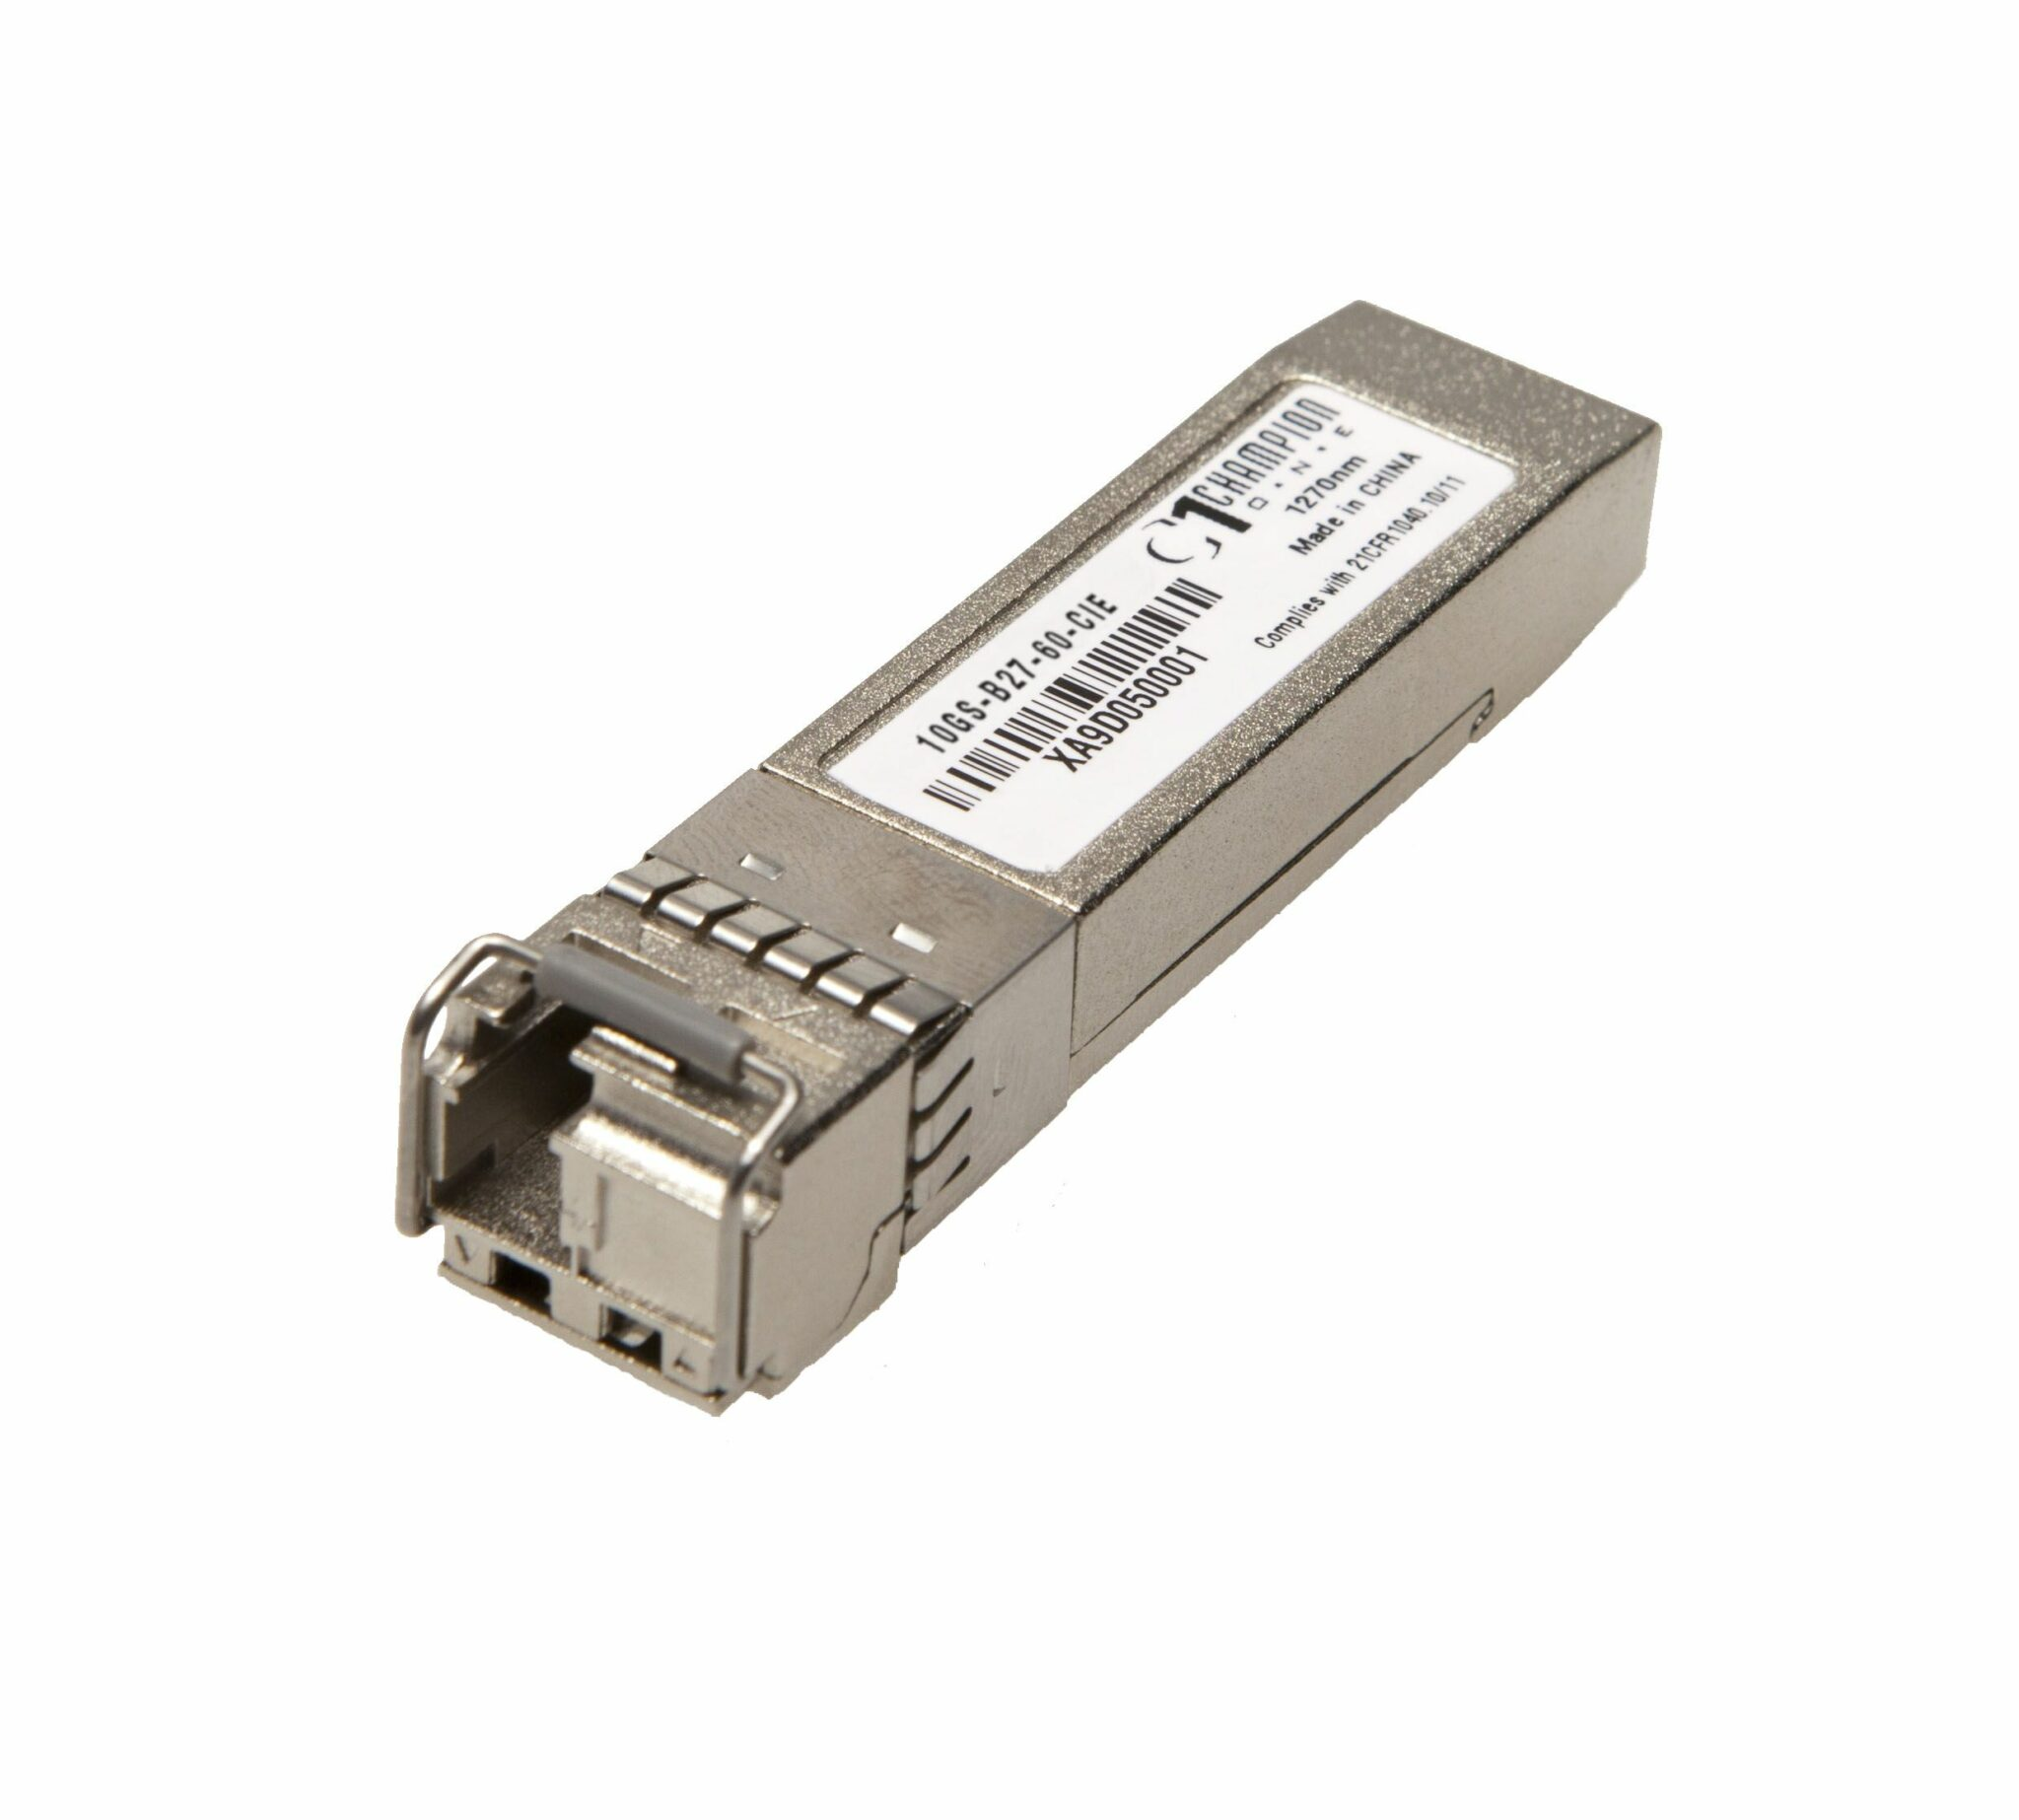 SFP+ SF 10GBase-ER 1330nm 60km, Ciena compatible